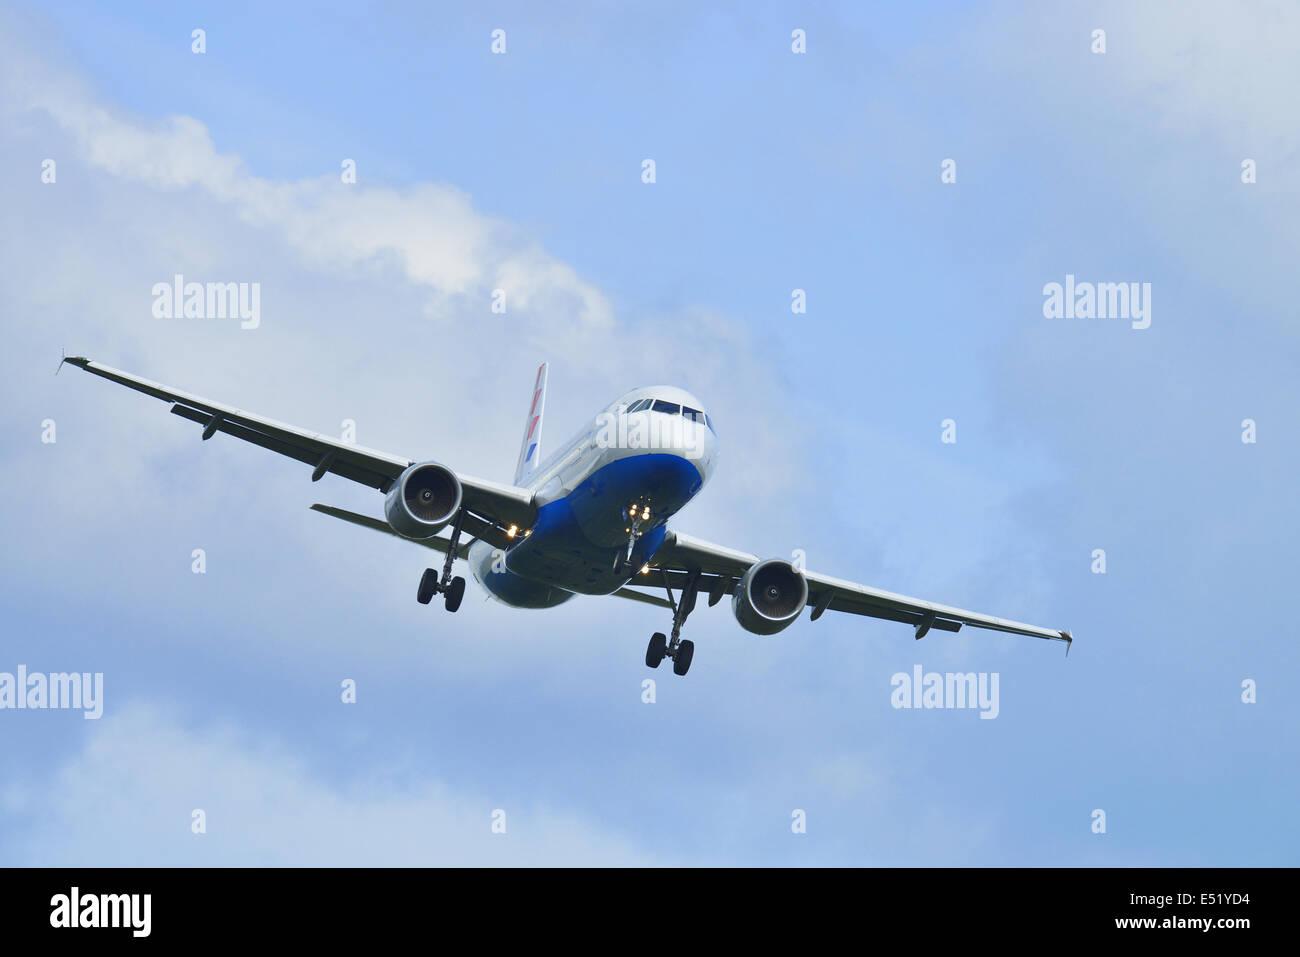 Landing aeroplane, Germany - Stock Image